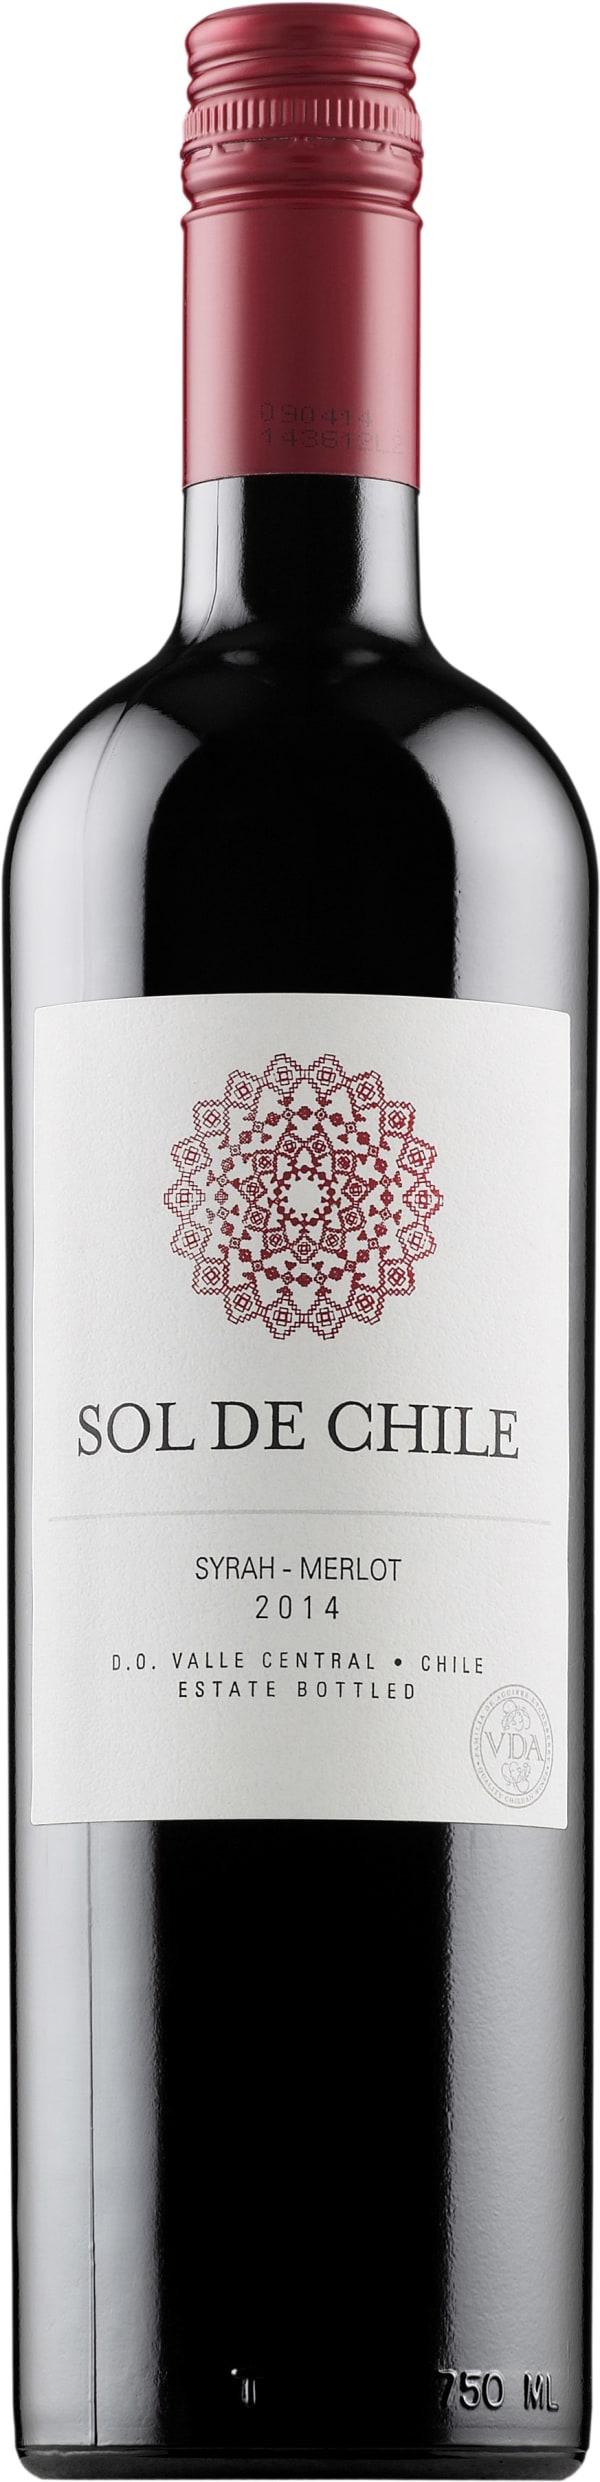 Sol de Chile Syrah Merlot 2016